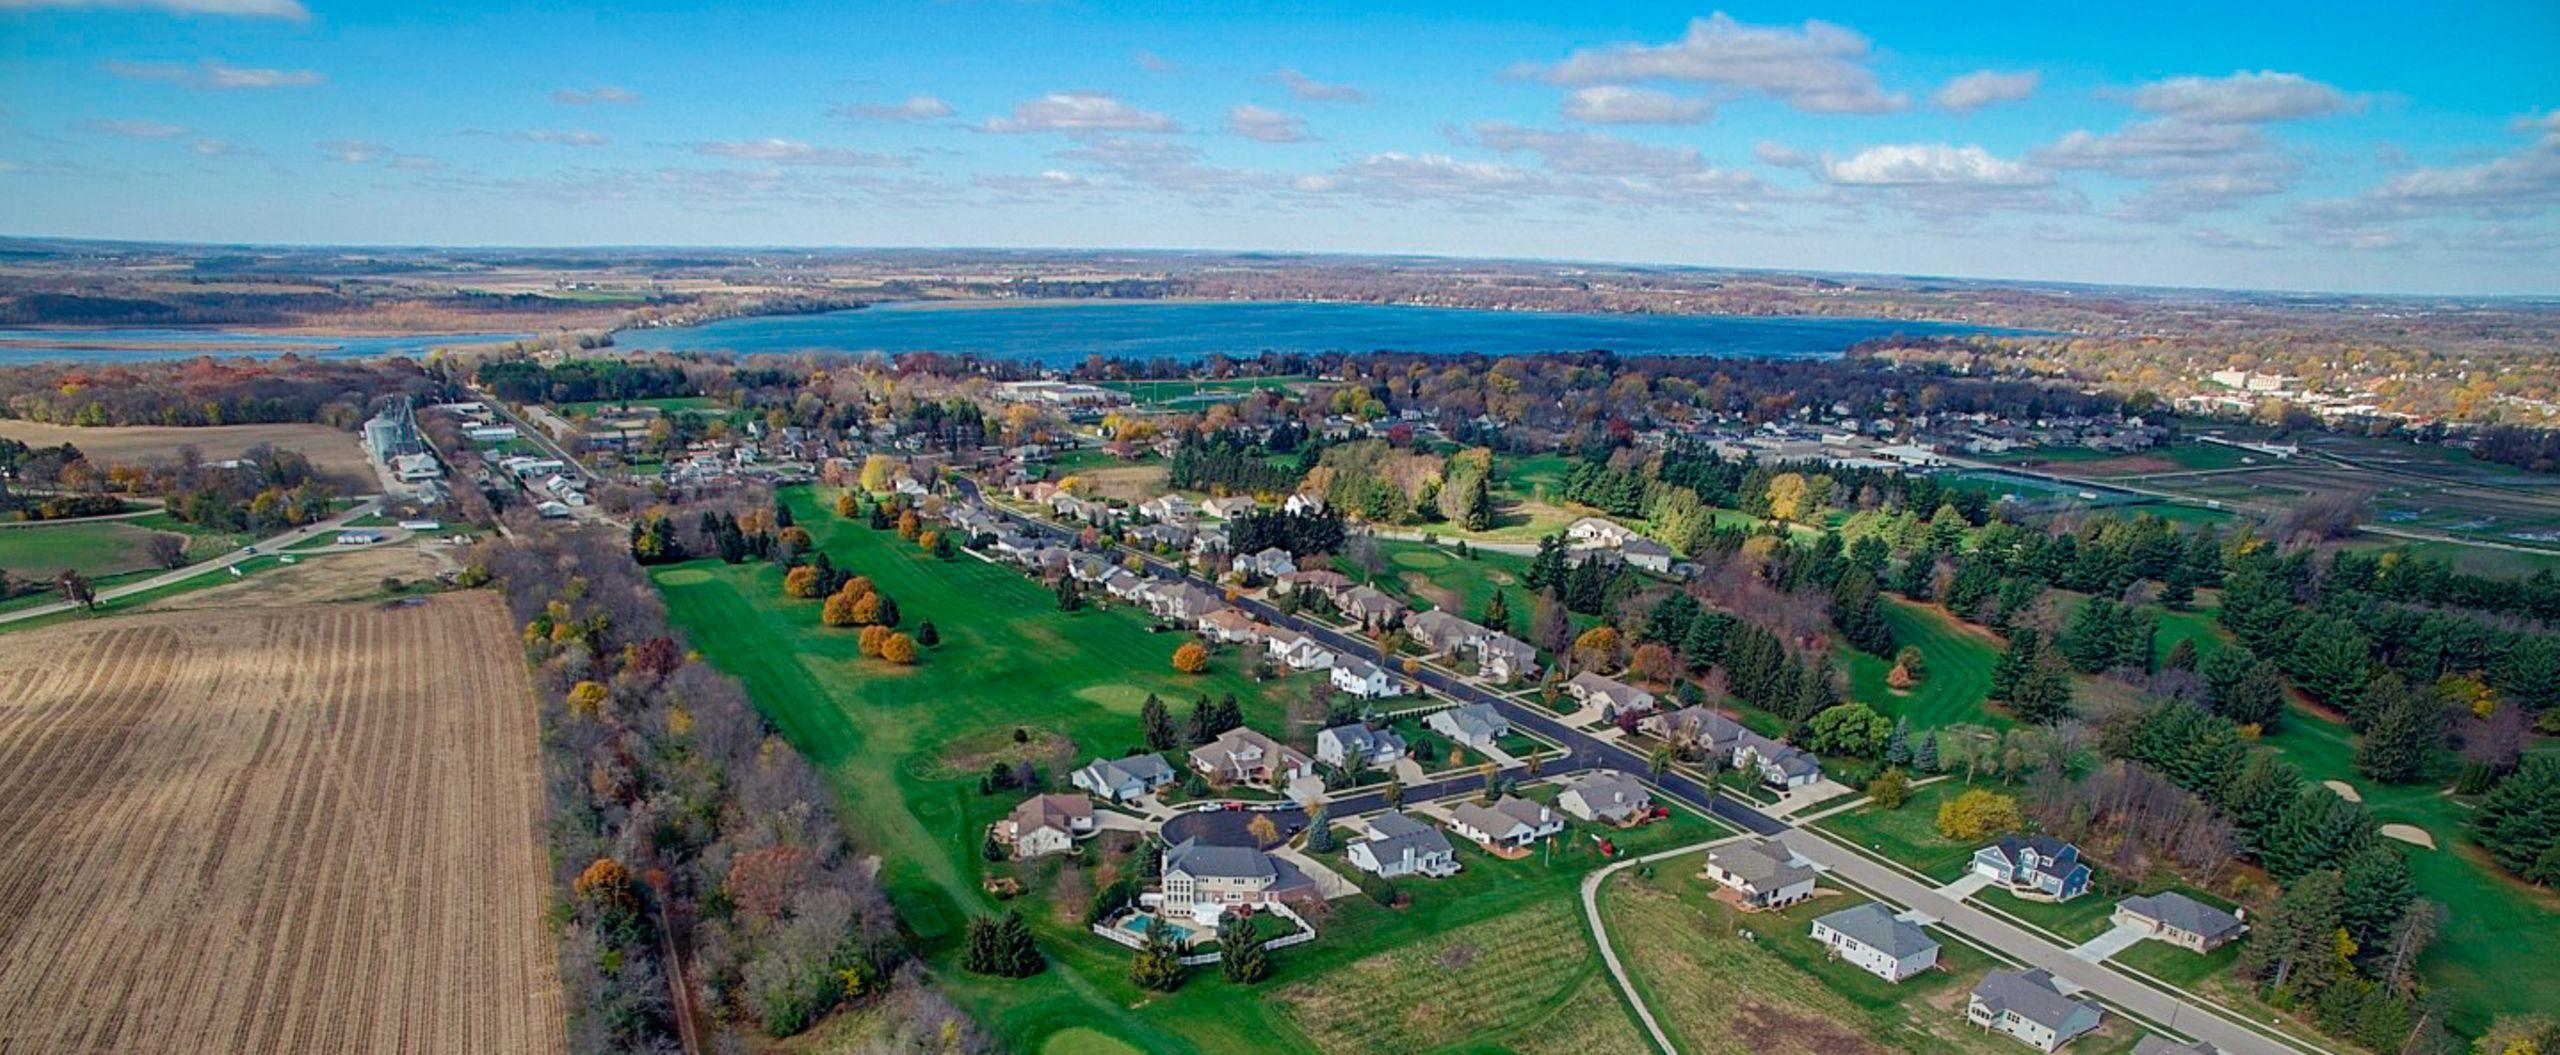 Lake Mills - Shannon Streich Real Estate